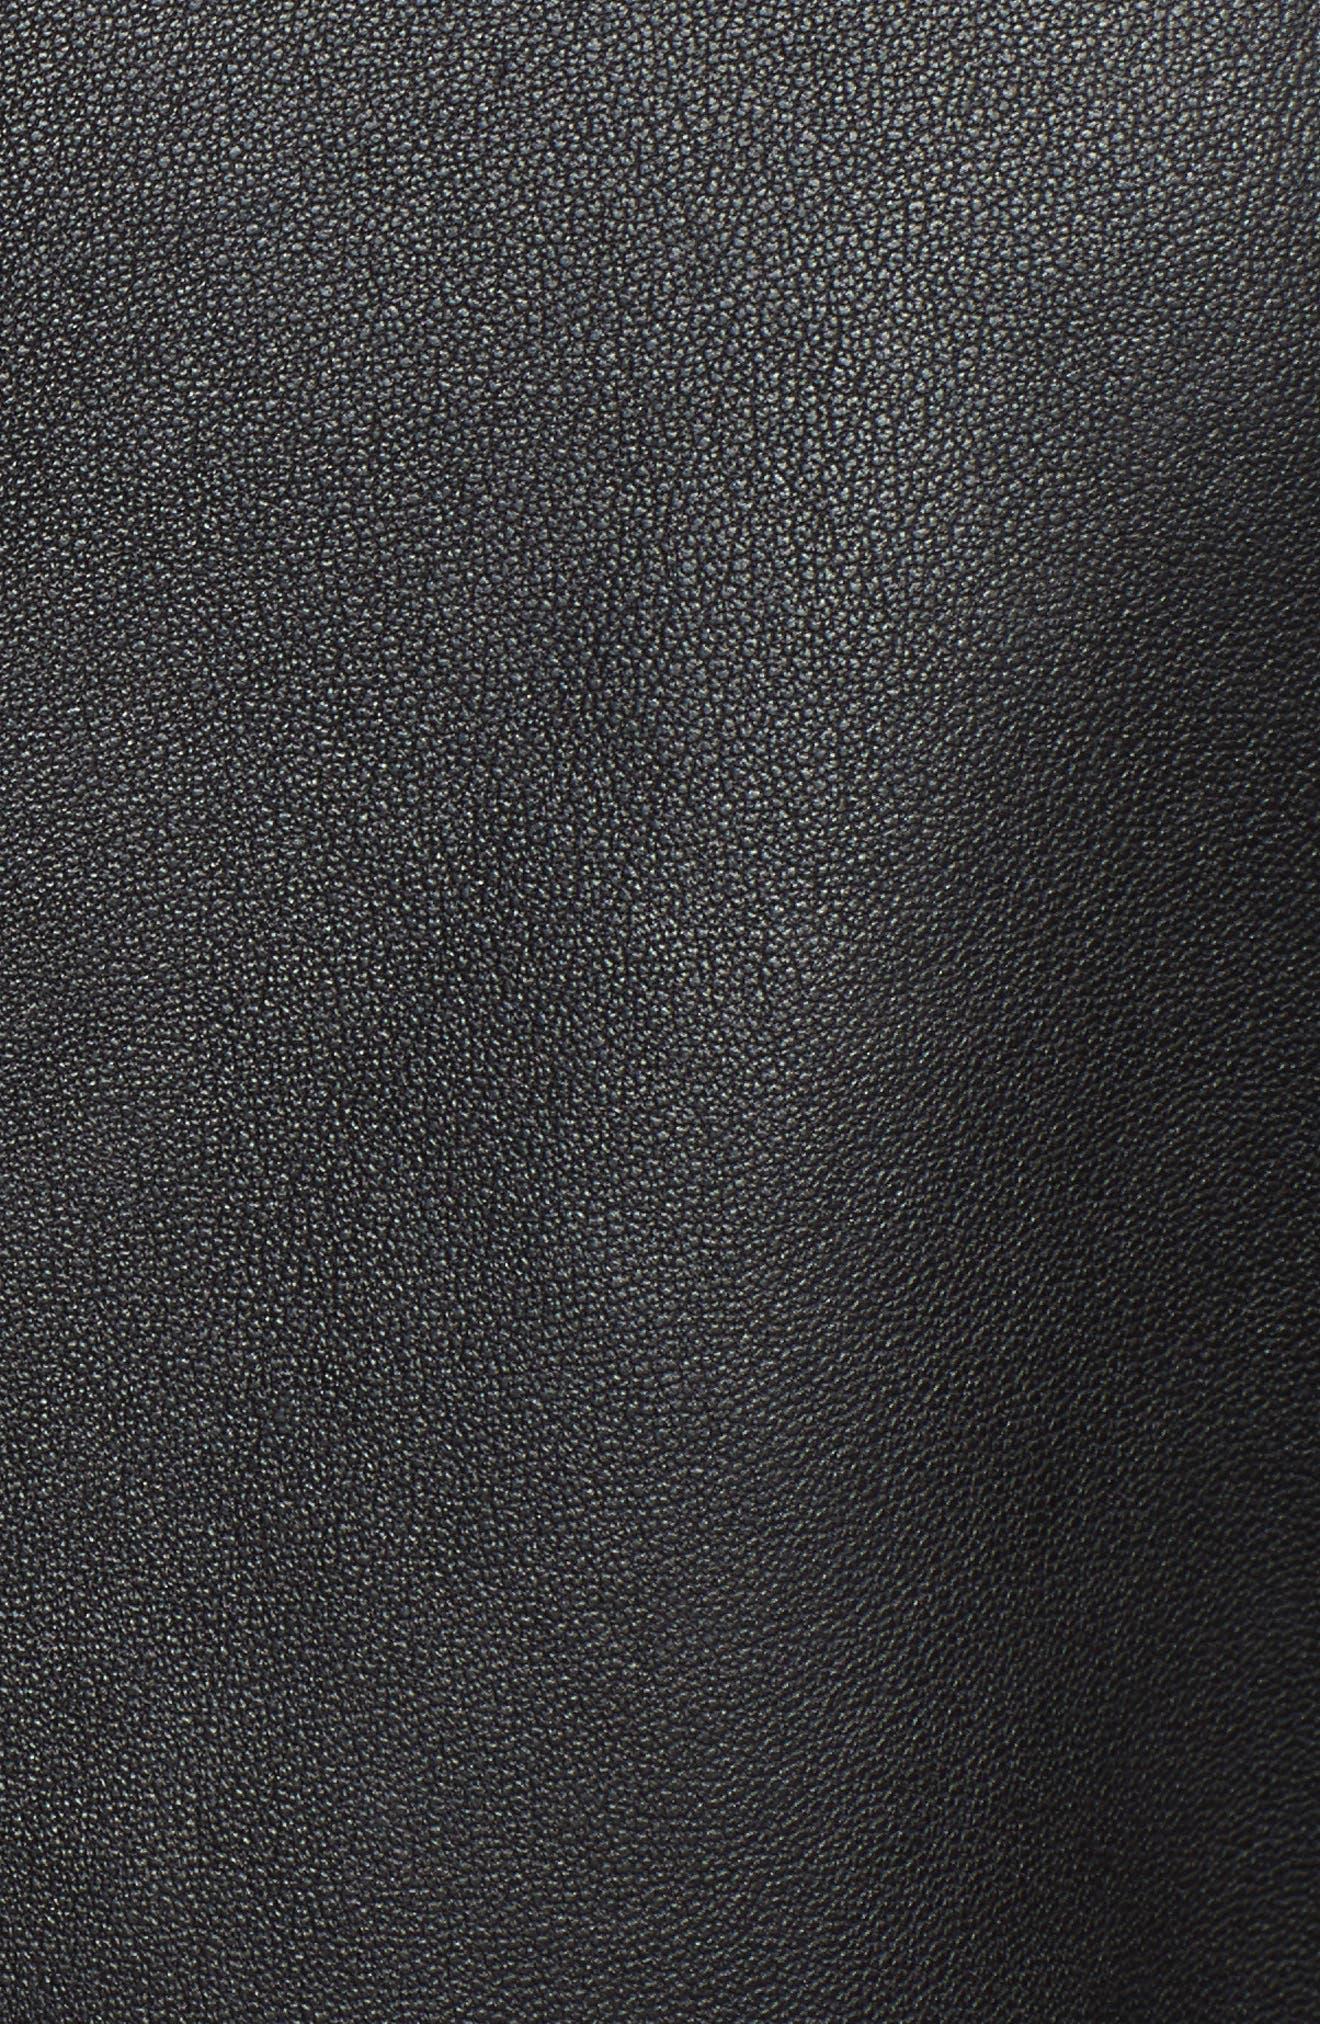 Alternate Image 5  - Ted Baker London Zip-Off Peplum Leather Biker Jacket